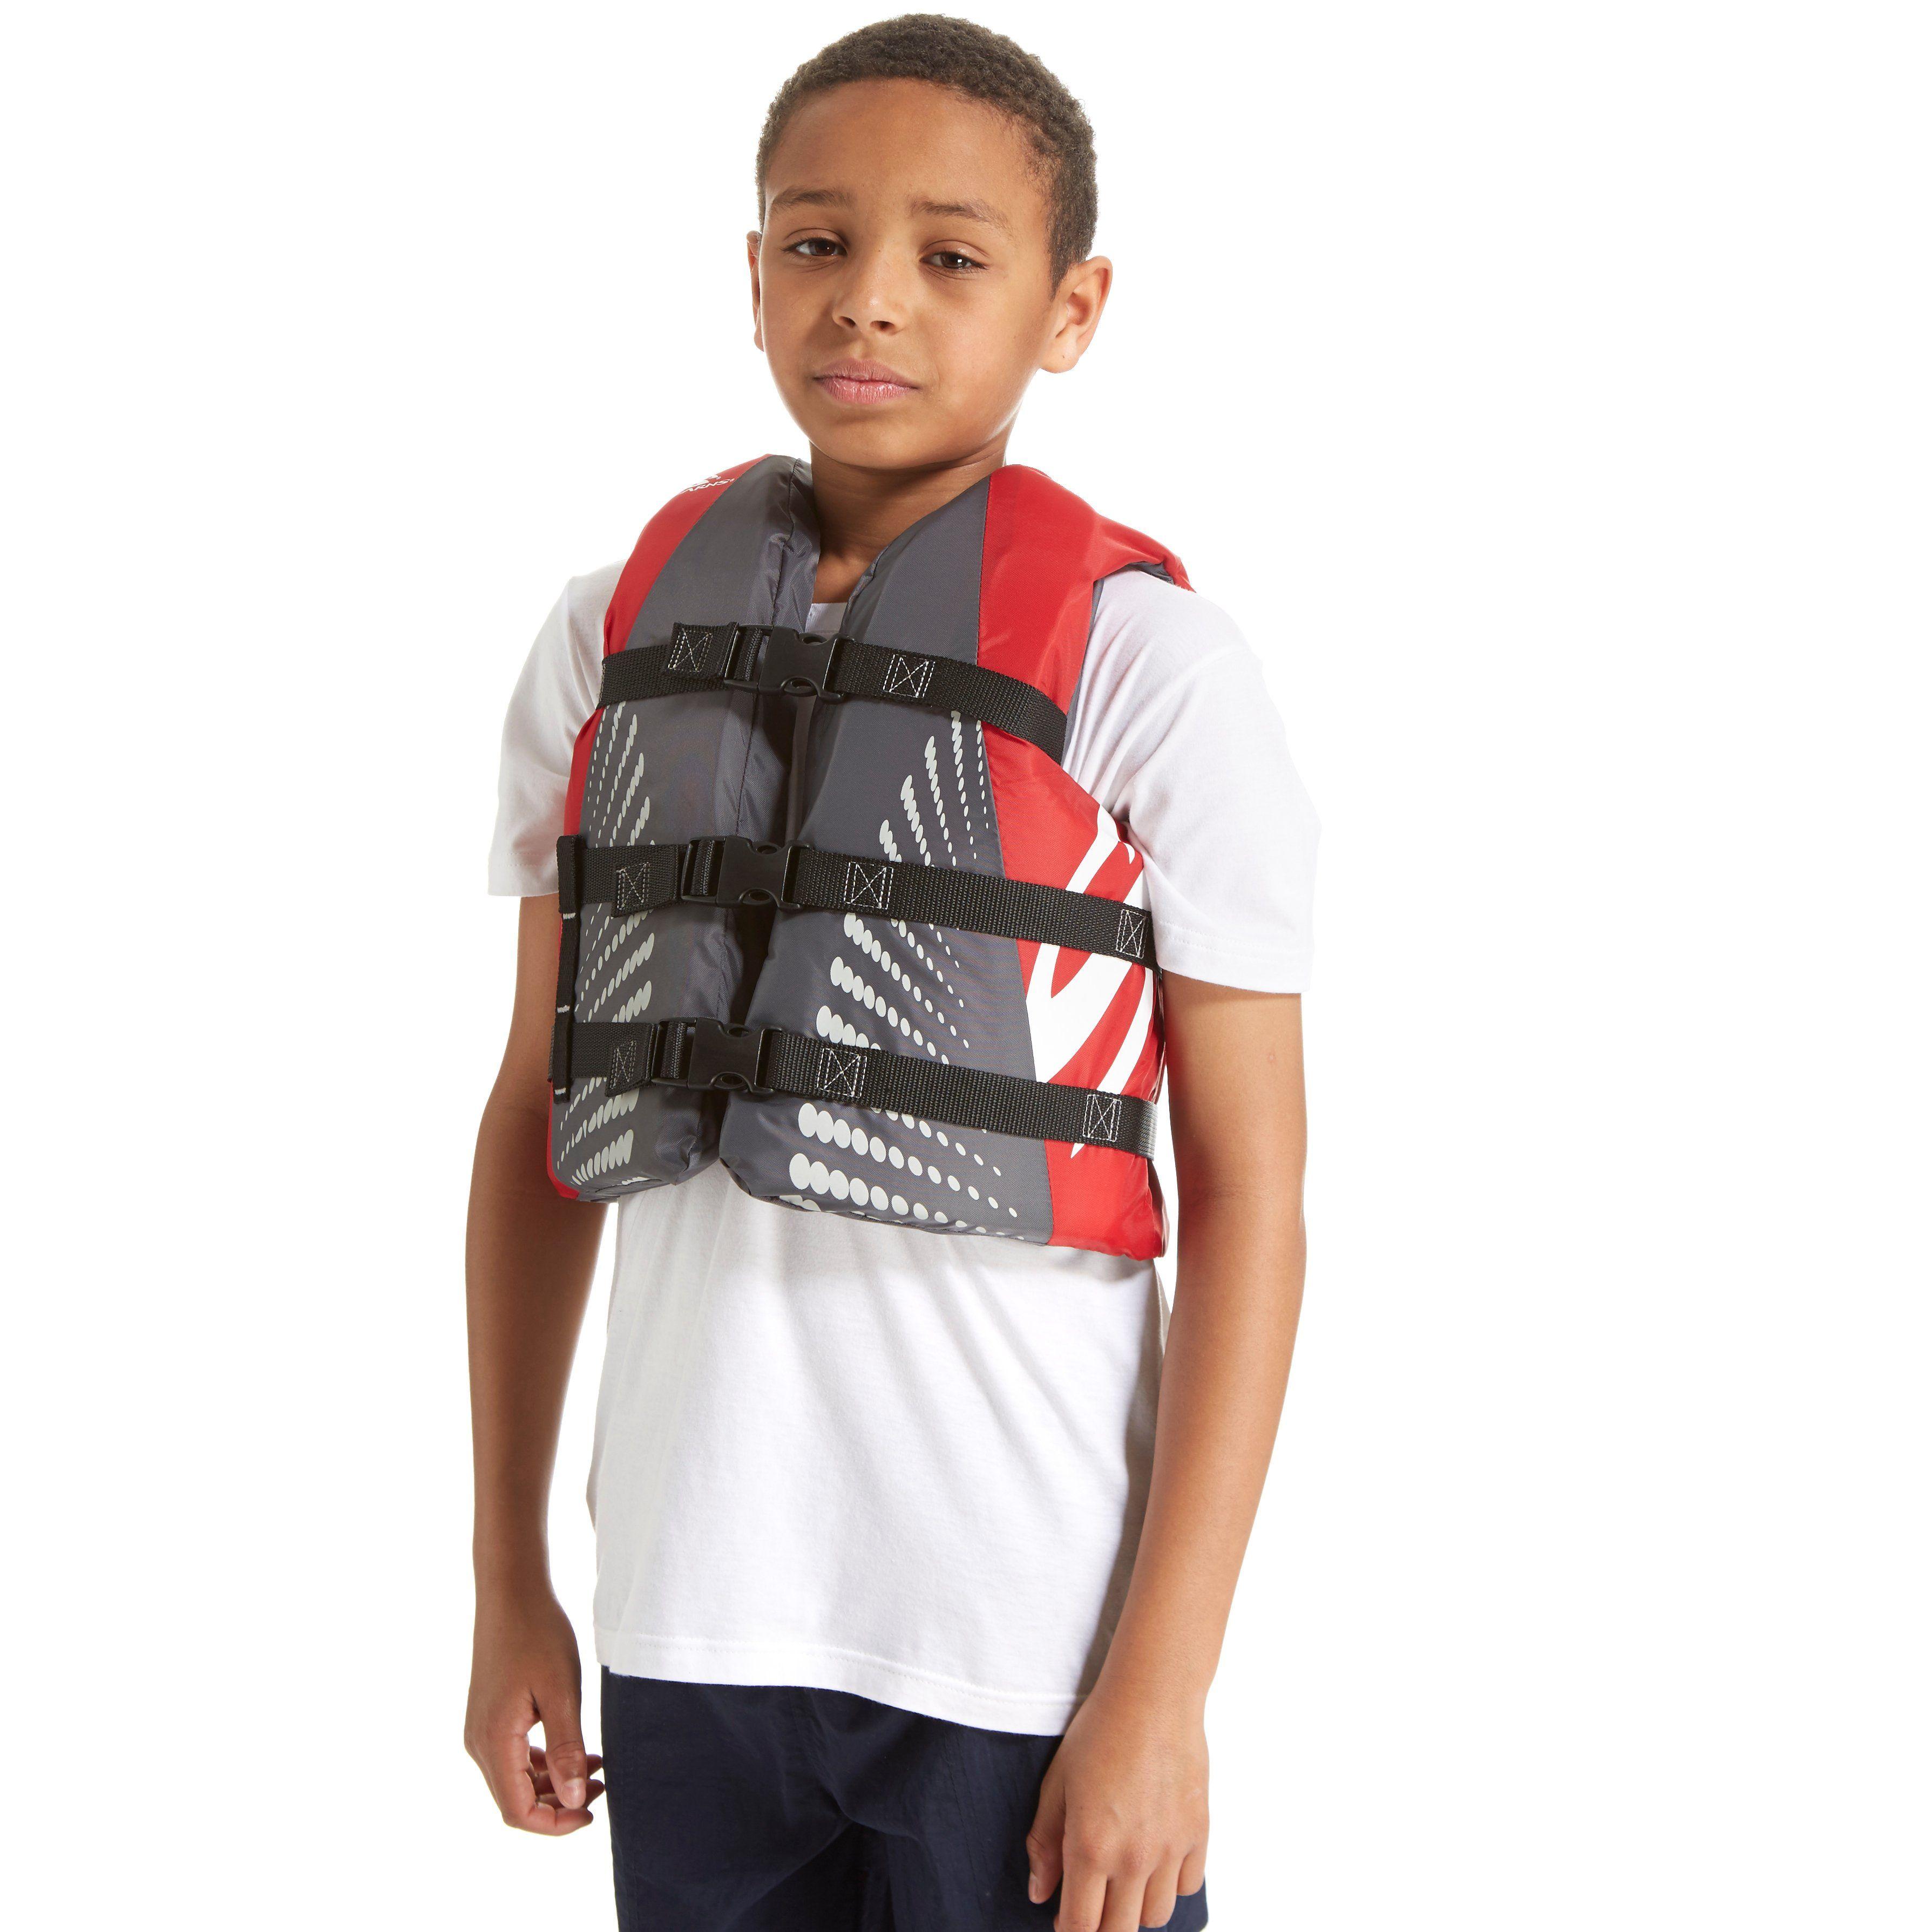 STEARNS Kid's Classic Mass Life Vest